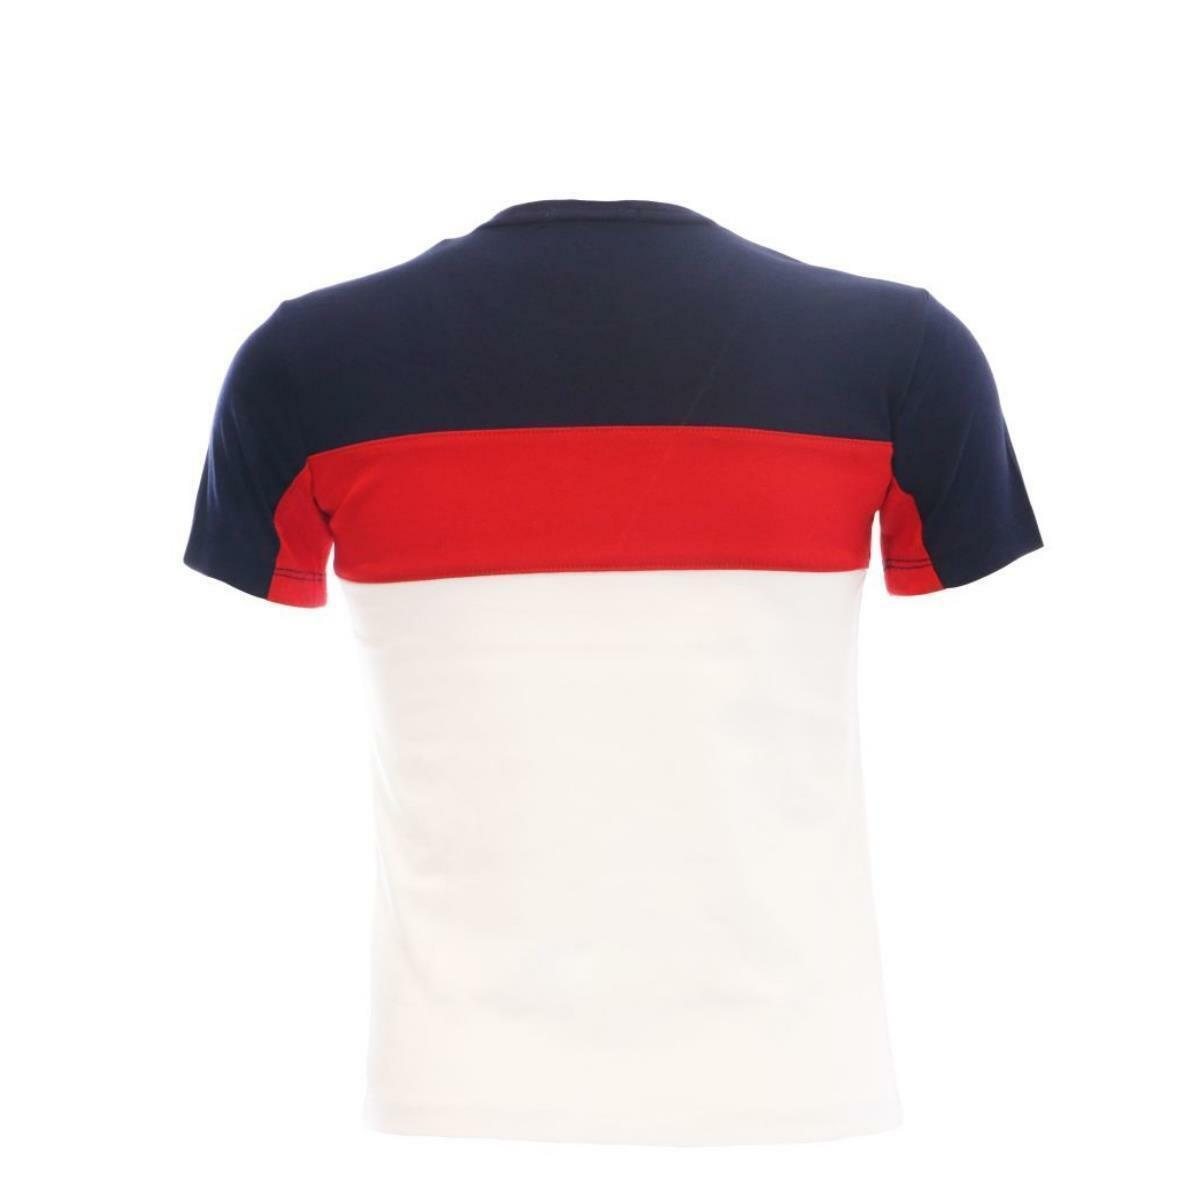 lotto lotto t-shirt bambino bianco blu rosso ltbss10